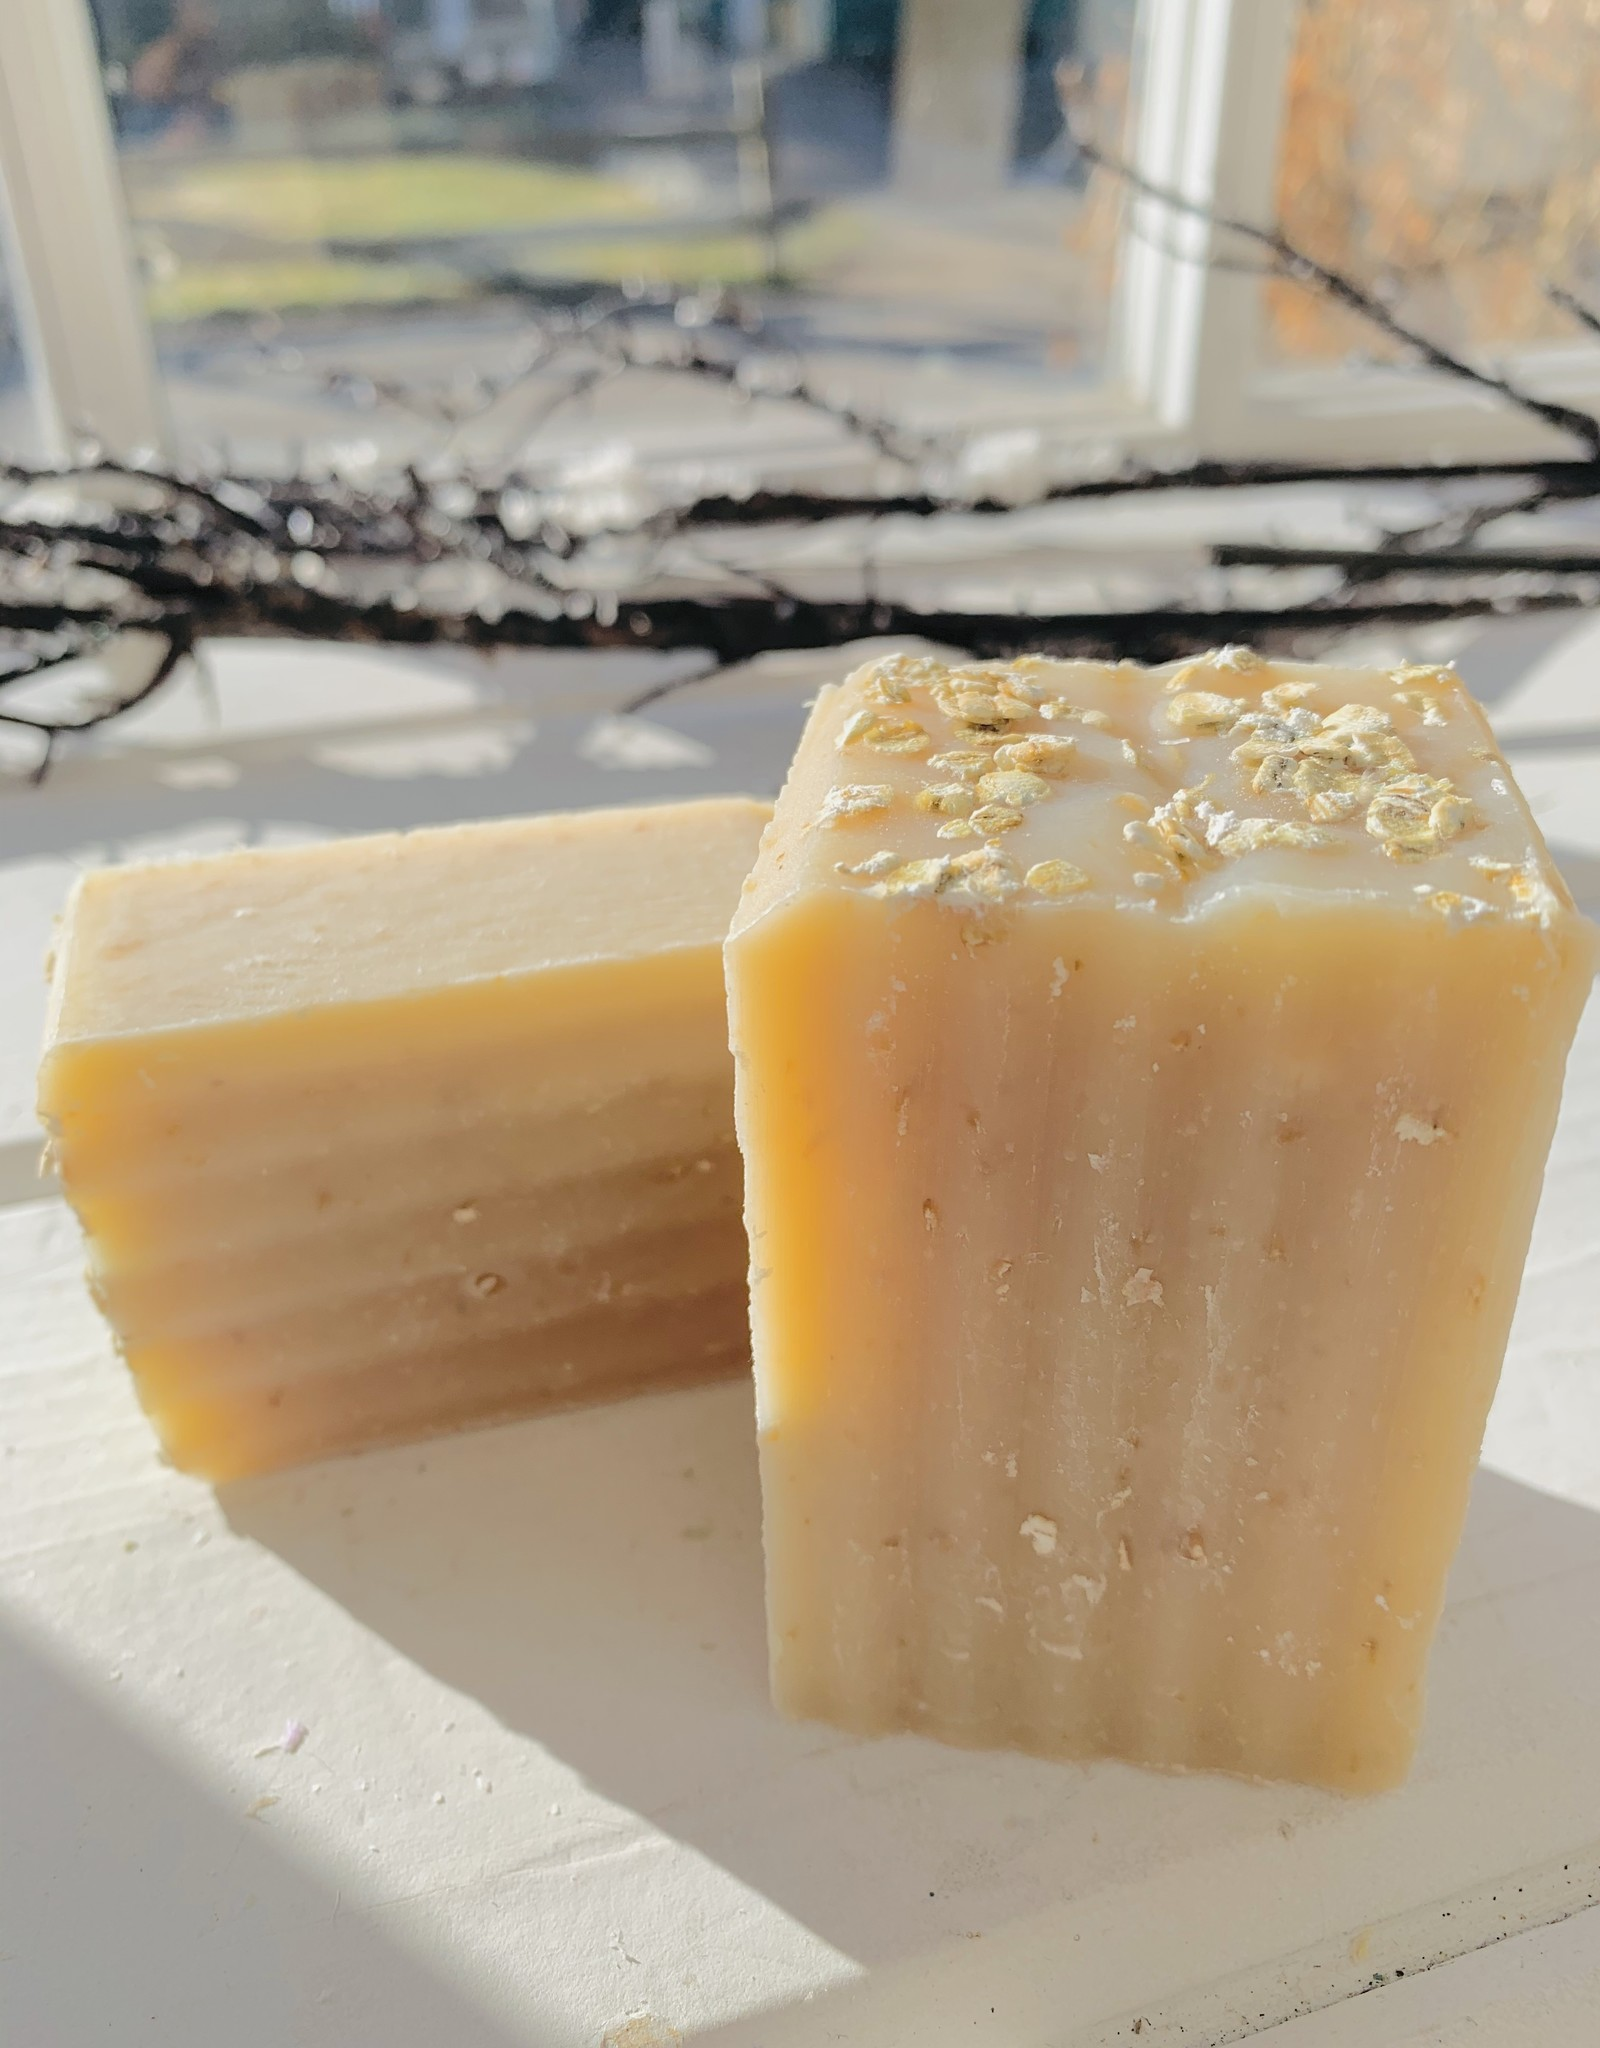 Becca Rose Oatmeal Lavender Goat Milk Soap 4 oz Bar